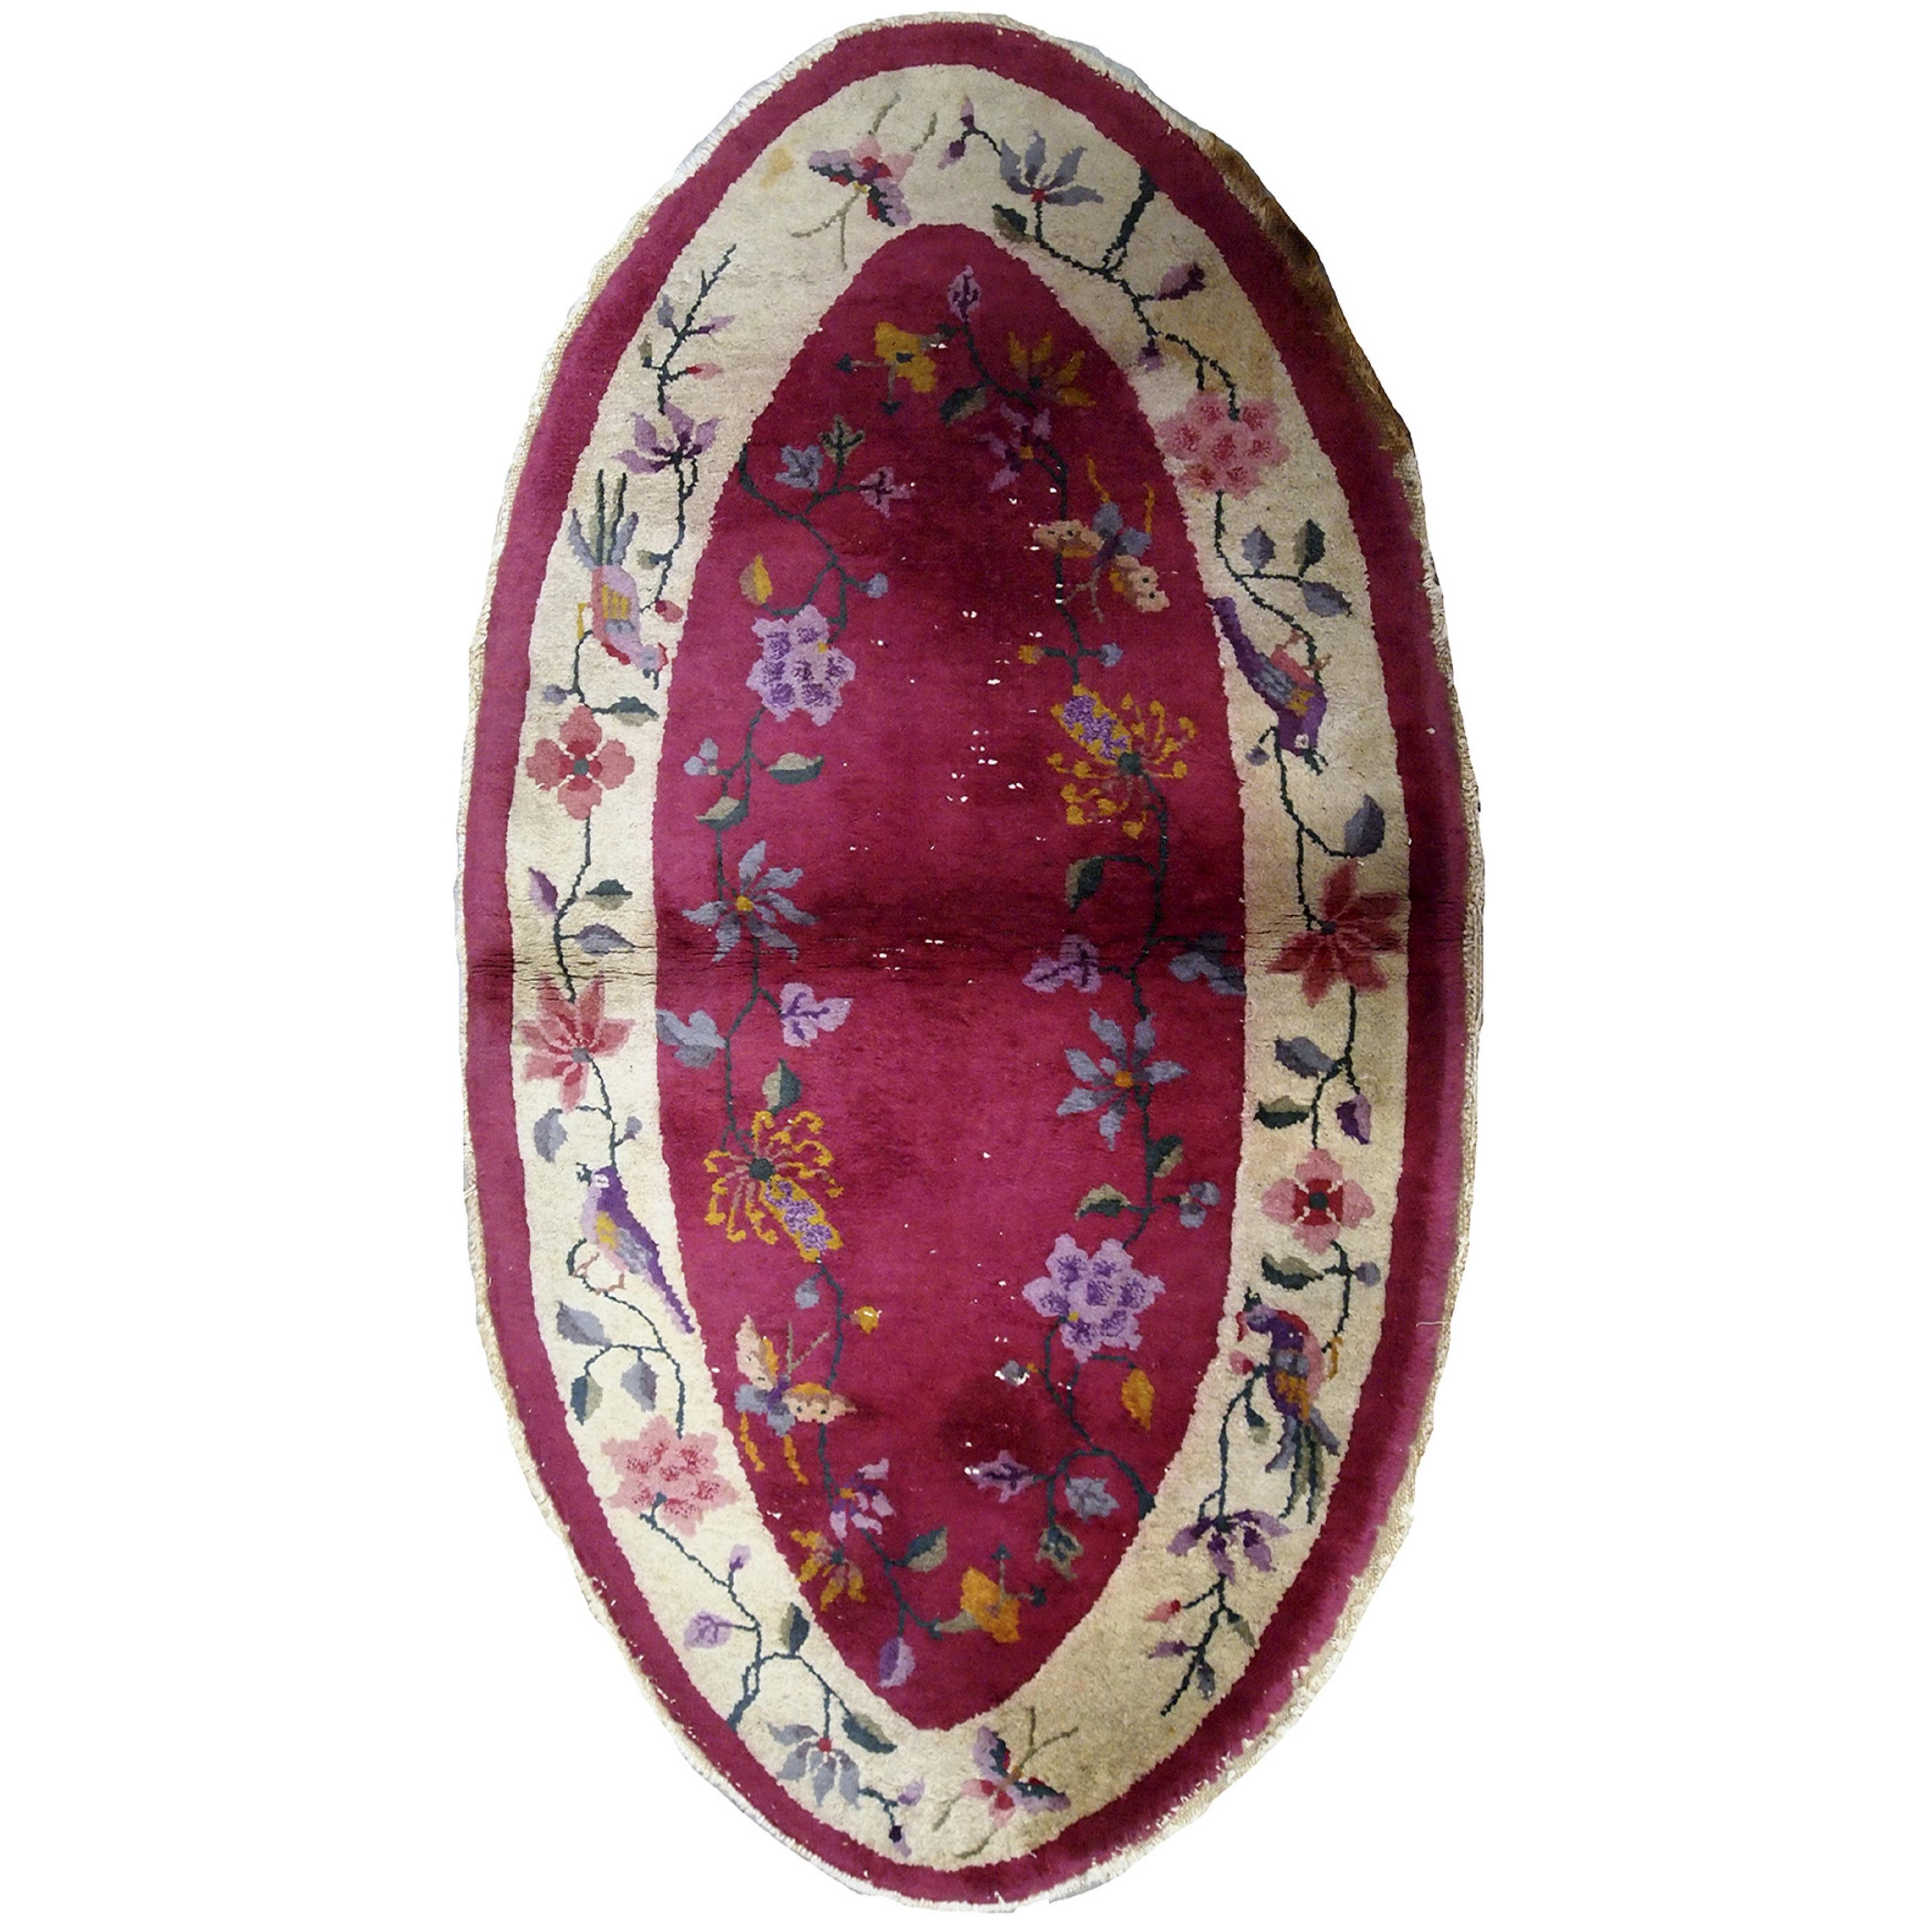 Handmade Antique Chinese Art Deco Rug, 1920s, 1B480